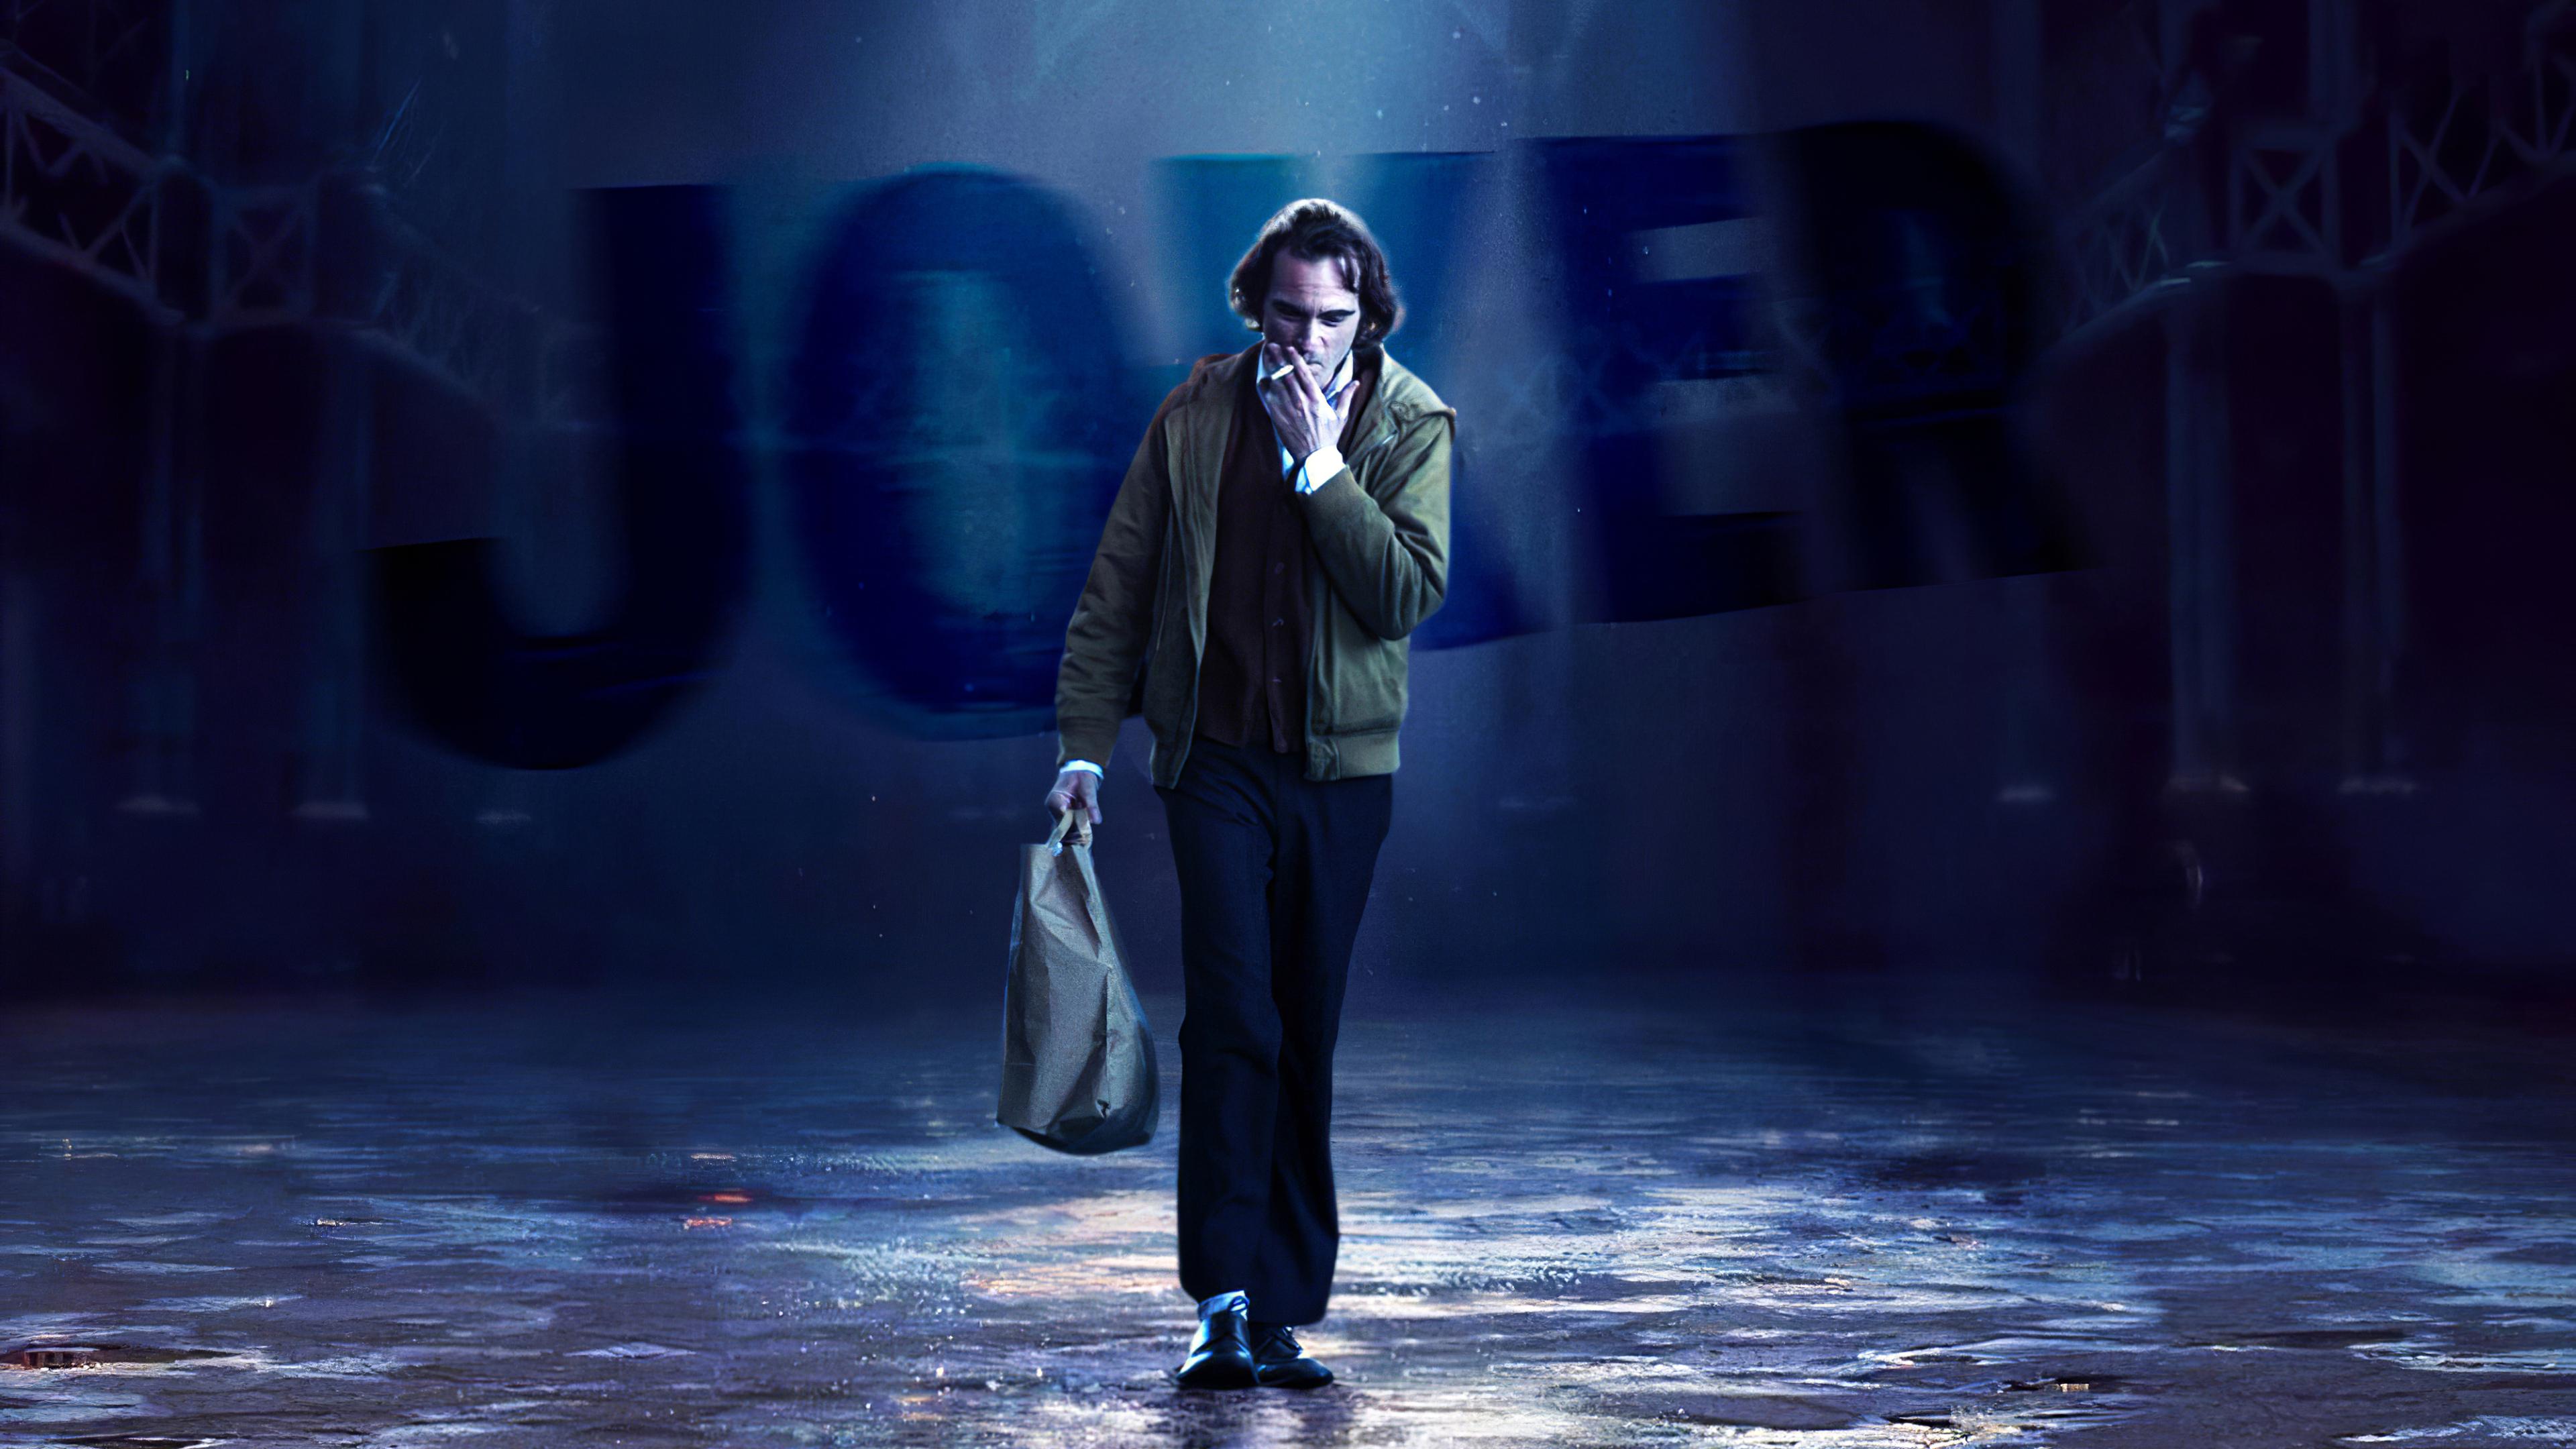 Joker 4K Wallpapers - Wallpapers HD